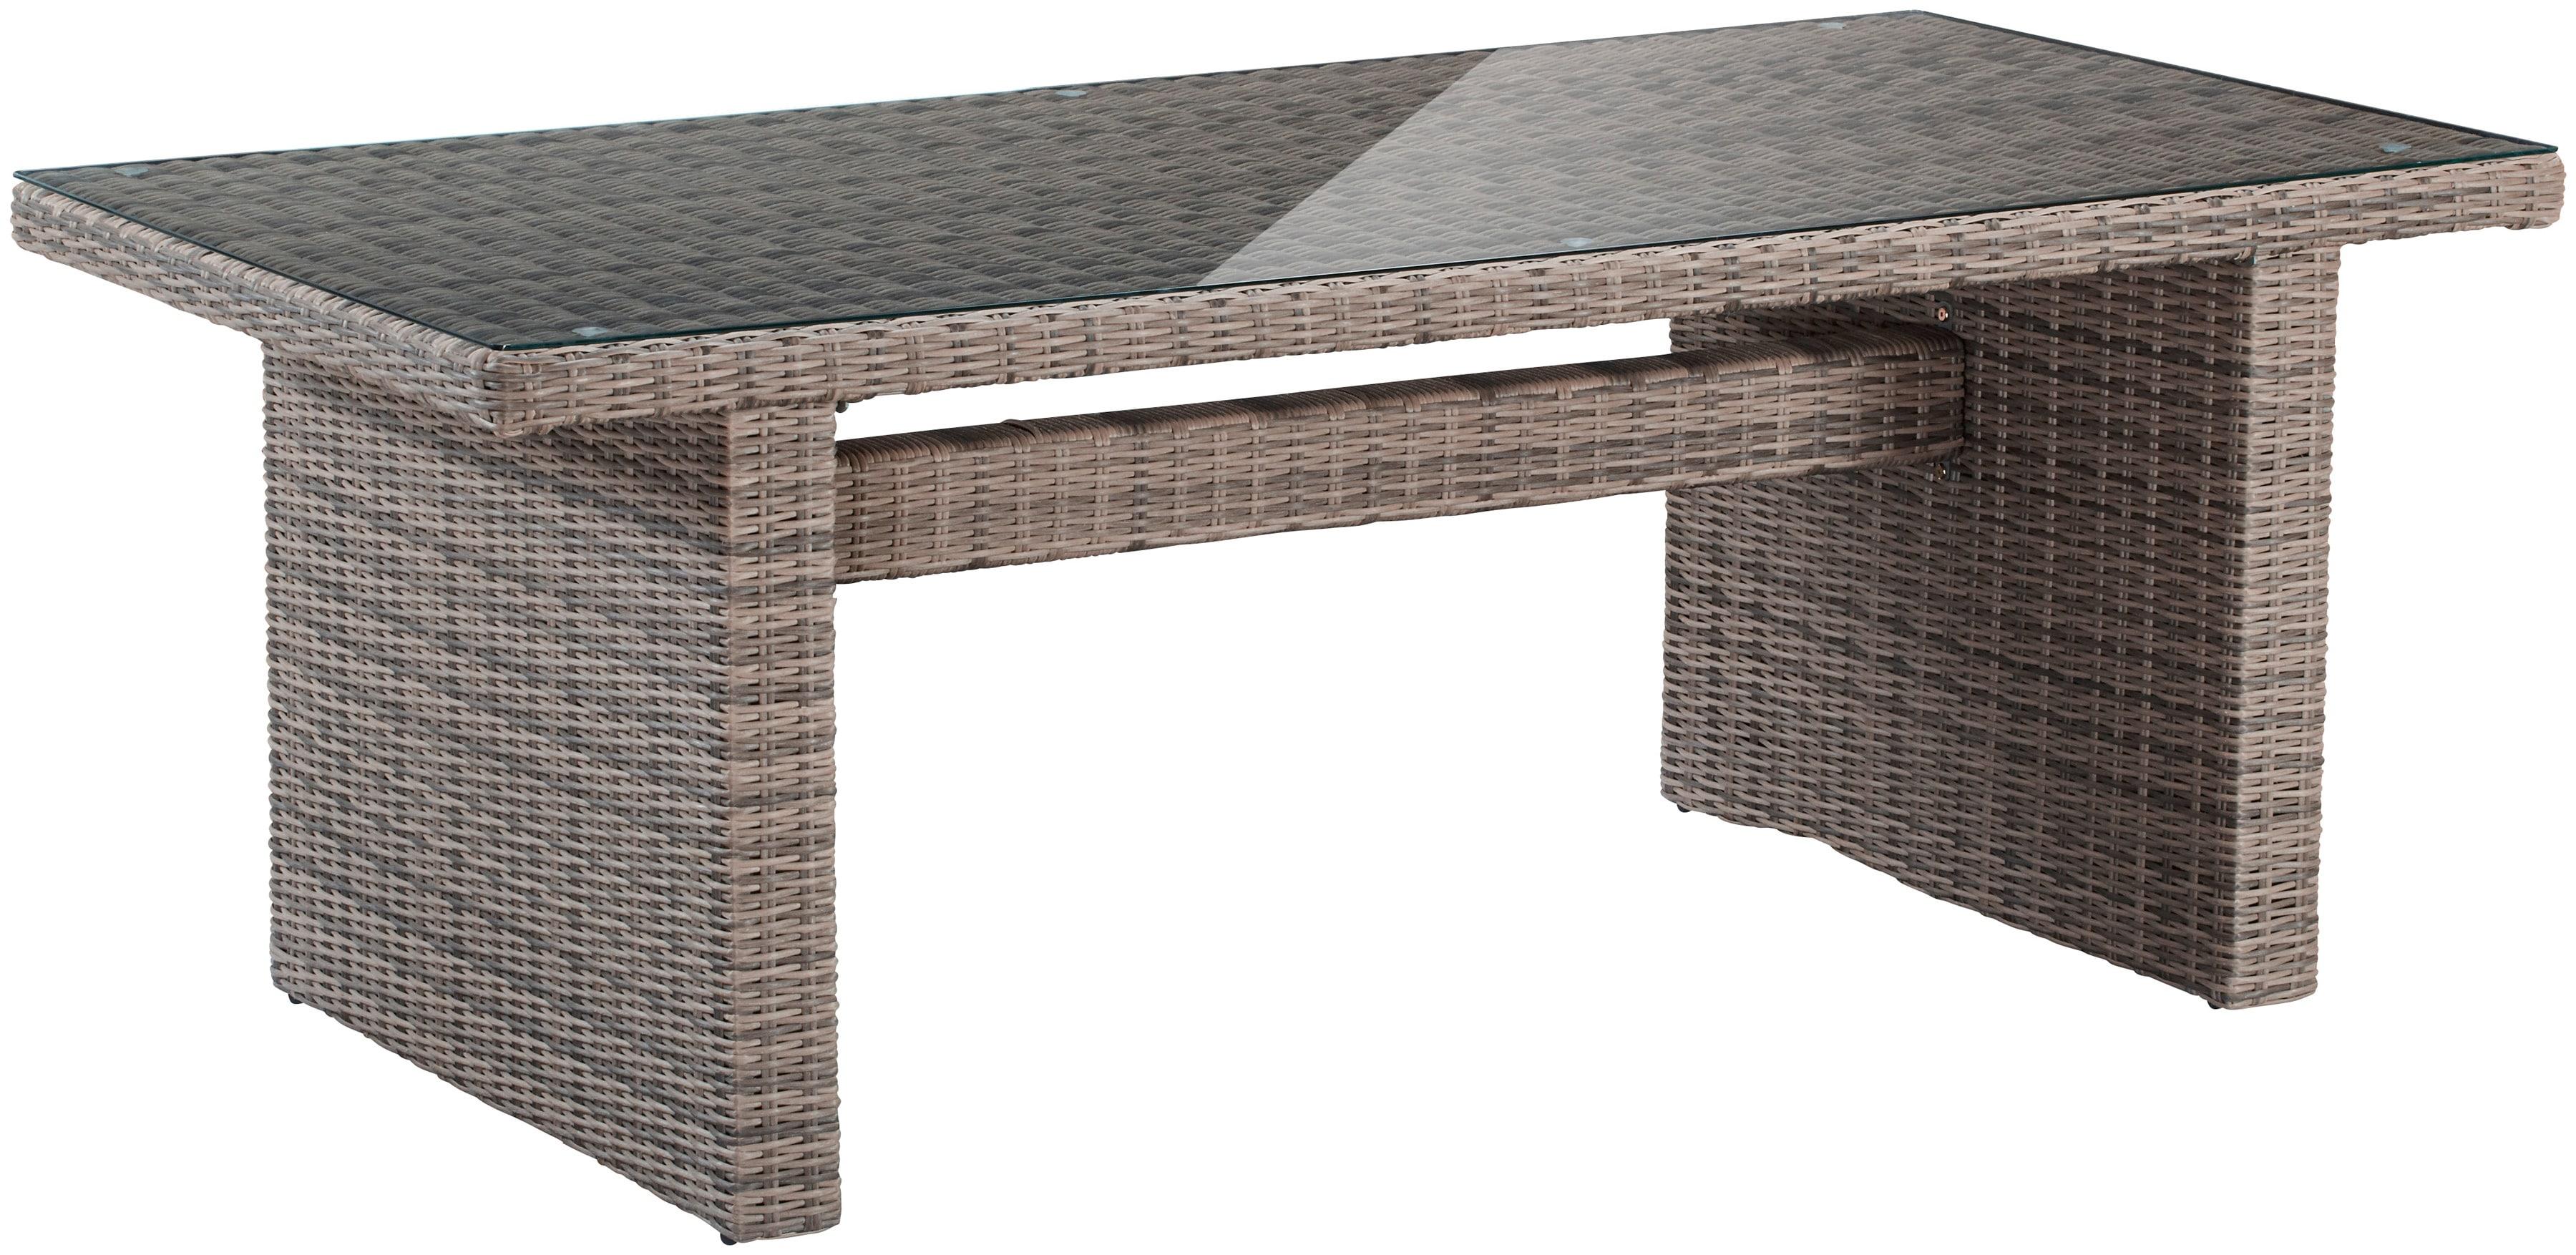 MERXX Gartentisch Riviera (B/L): ca 100x200 cm Polyrattan